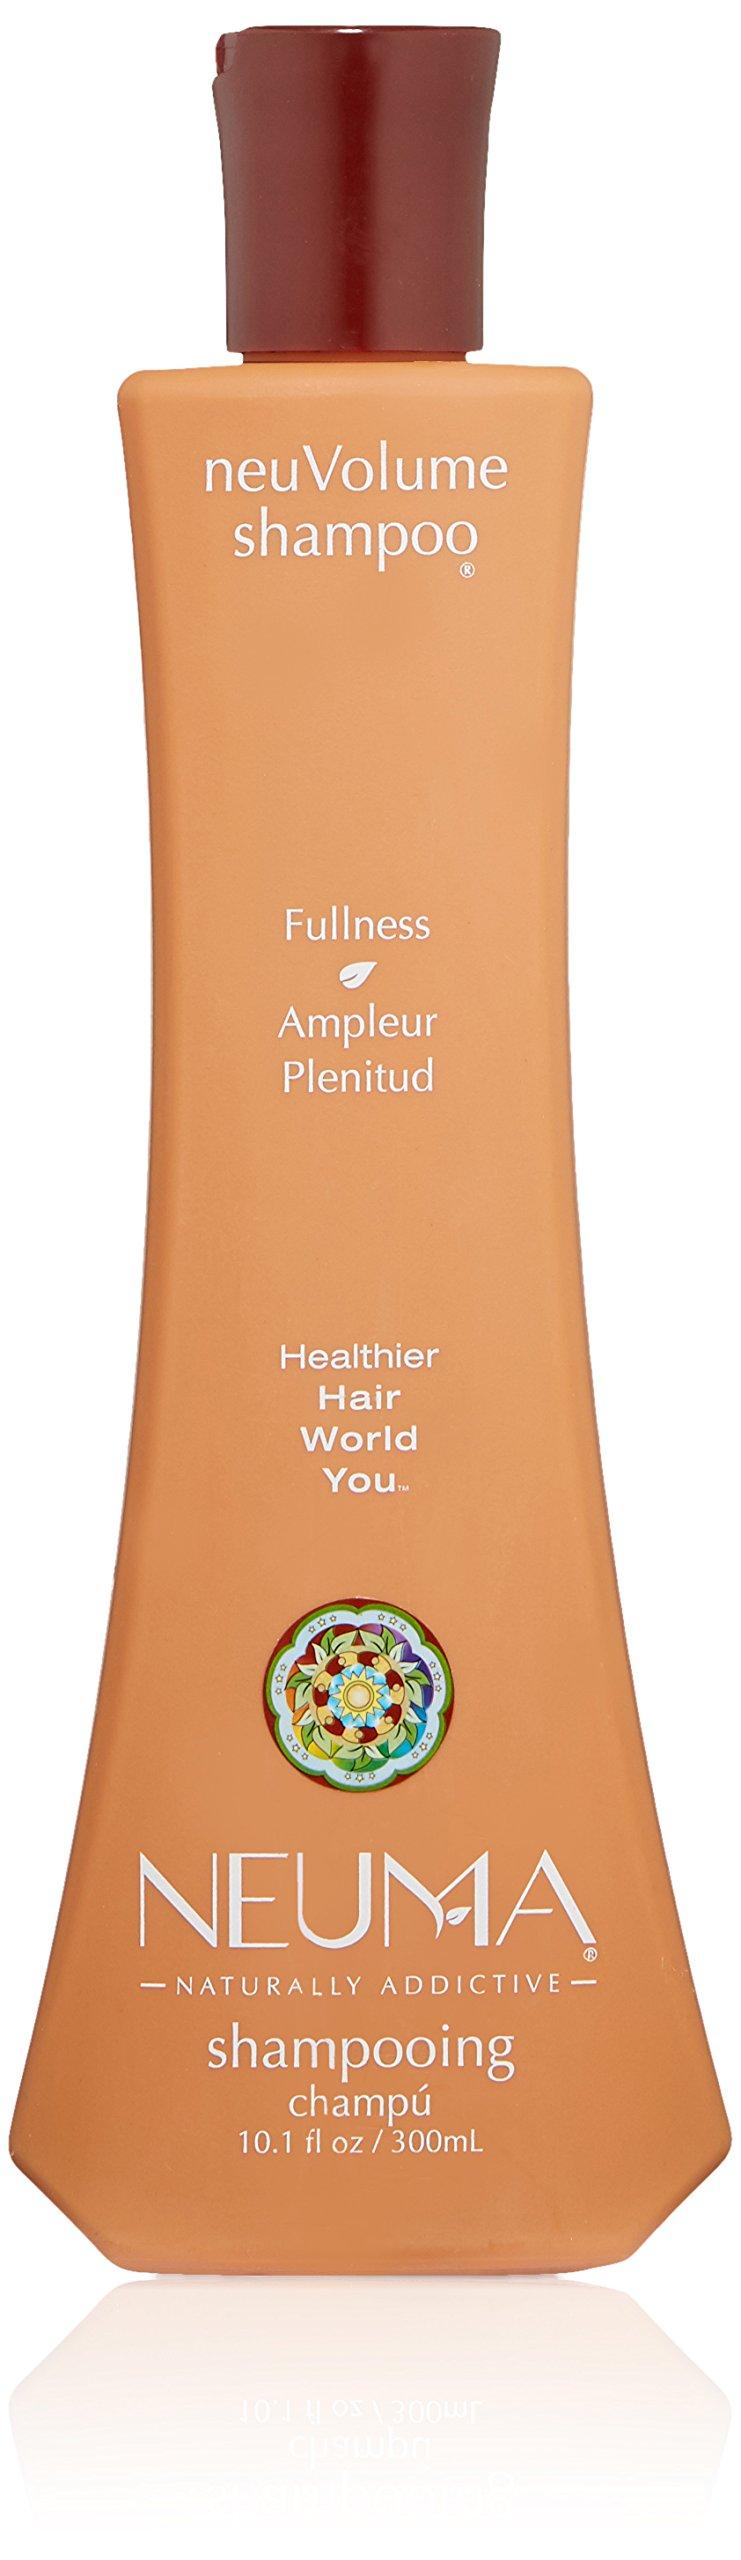 NEUMA neuVolume Fullness Shampoo, 10.1 oz.